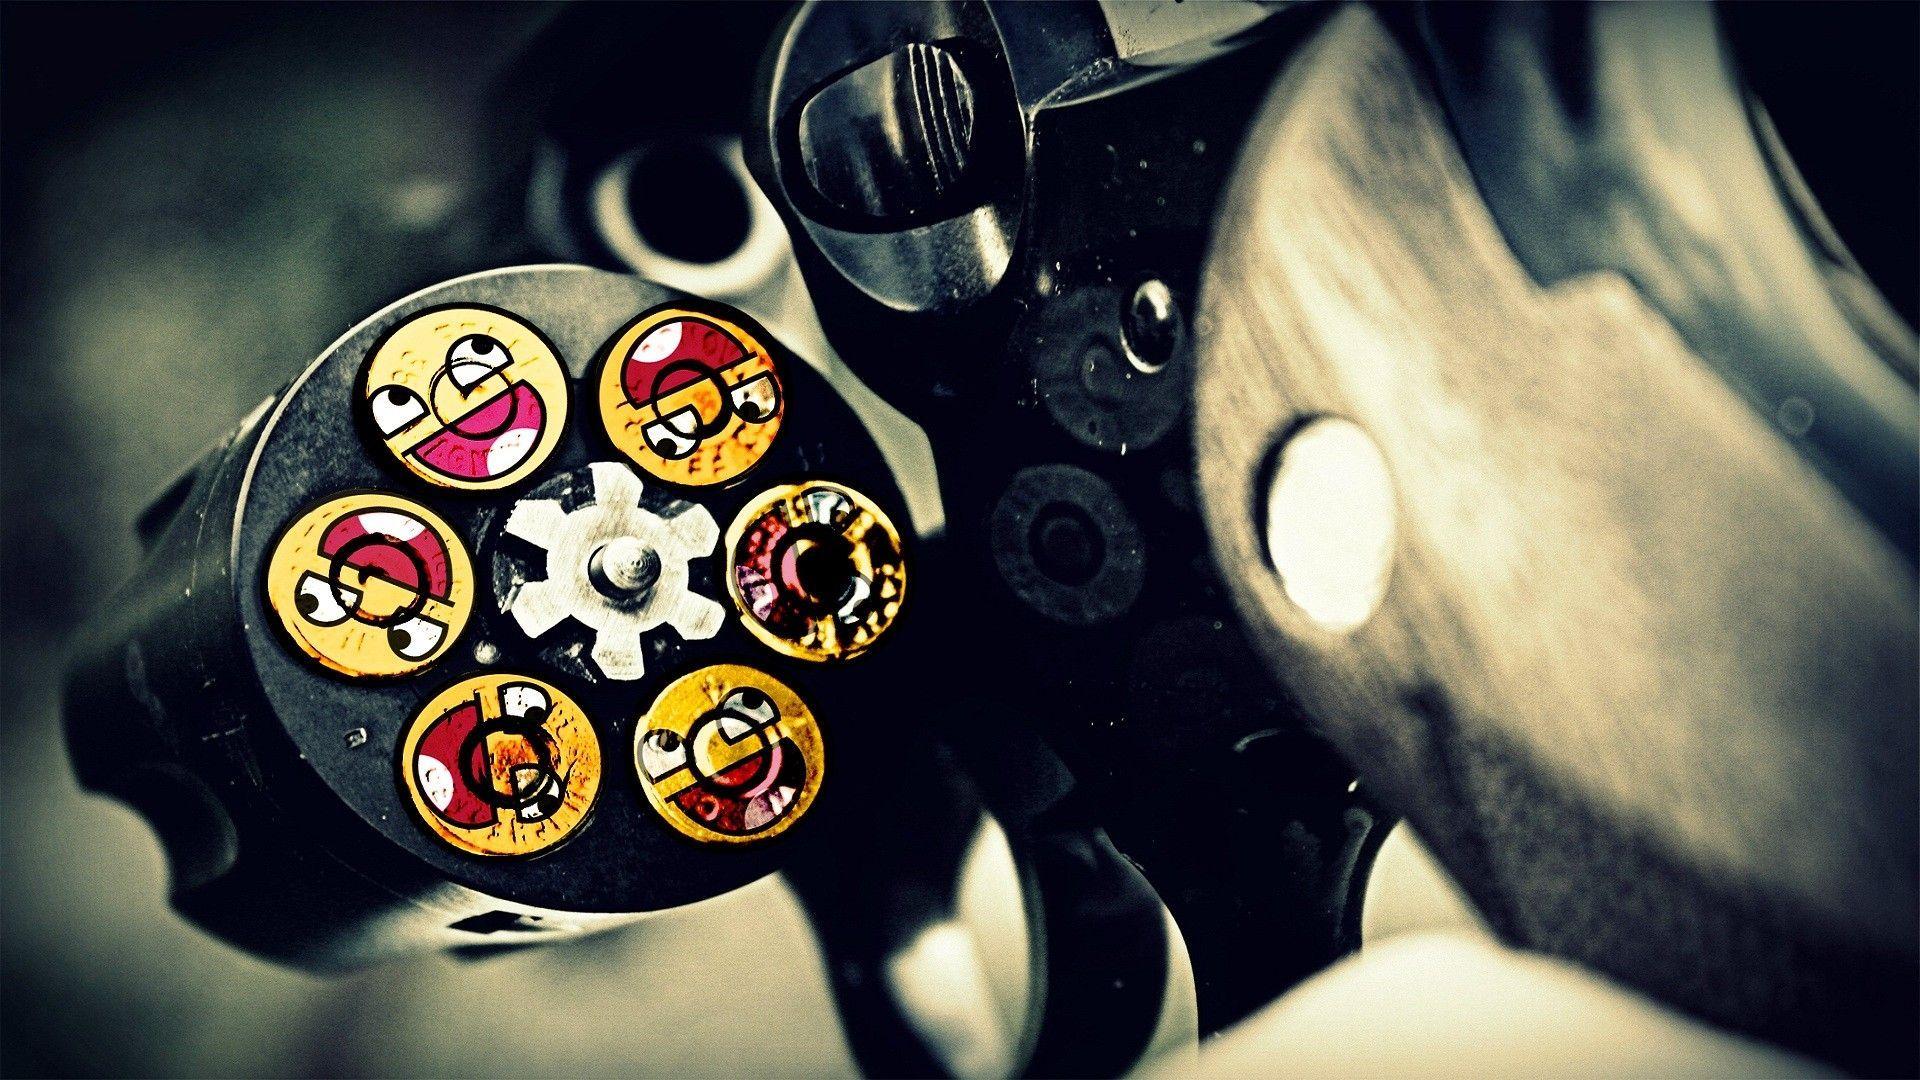 smiley face ammunition